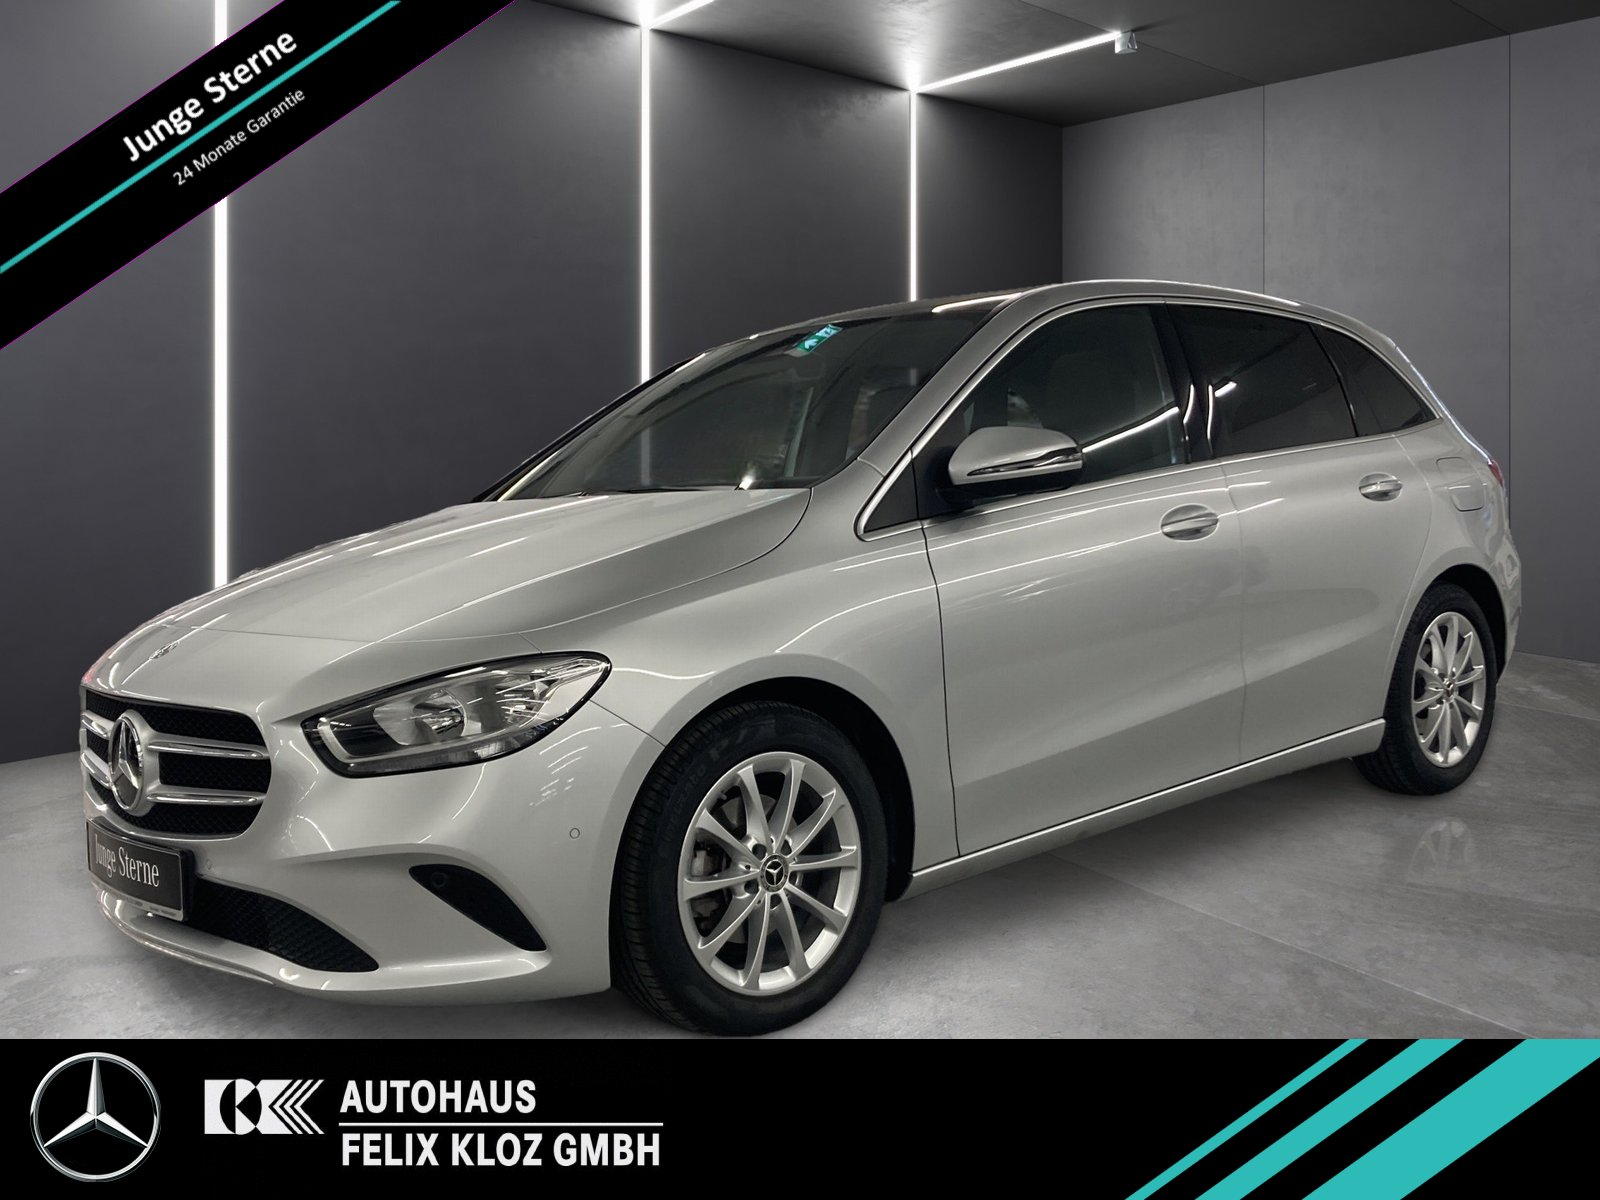 Mercedes-Benz B 180 Progressive Panorama*Sitzhzg*Park-As.*MBUX, Jahr 2019, Benzin